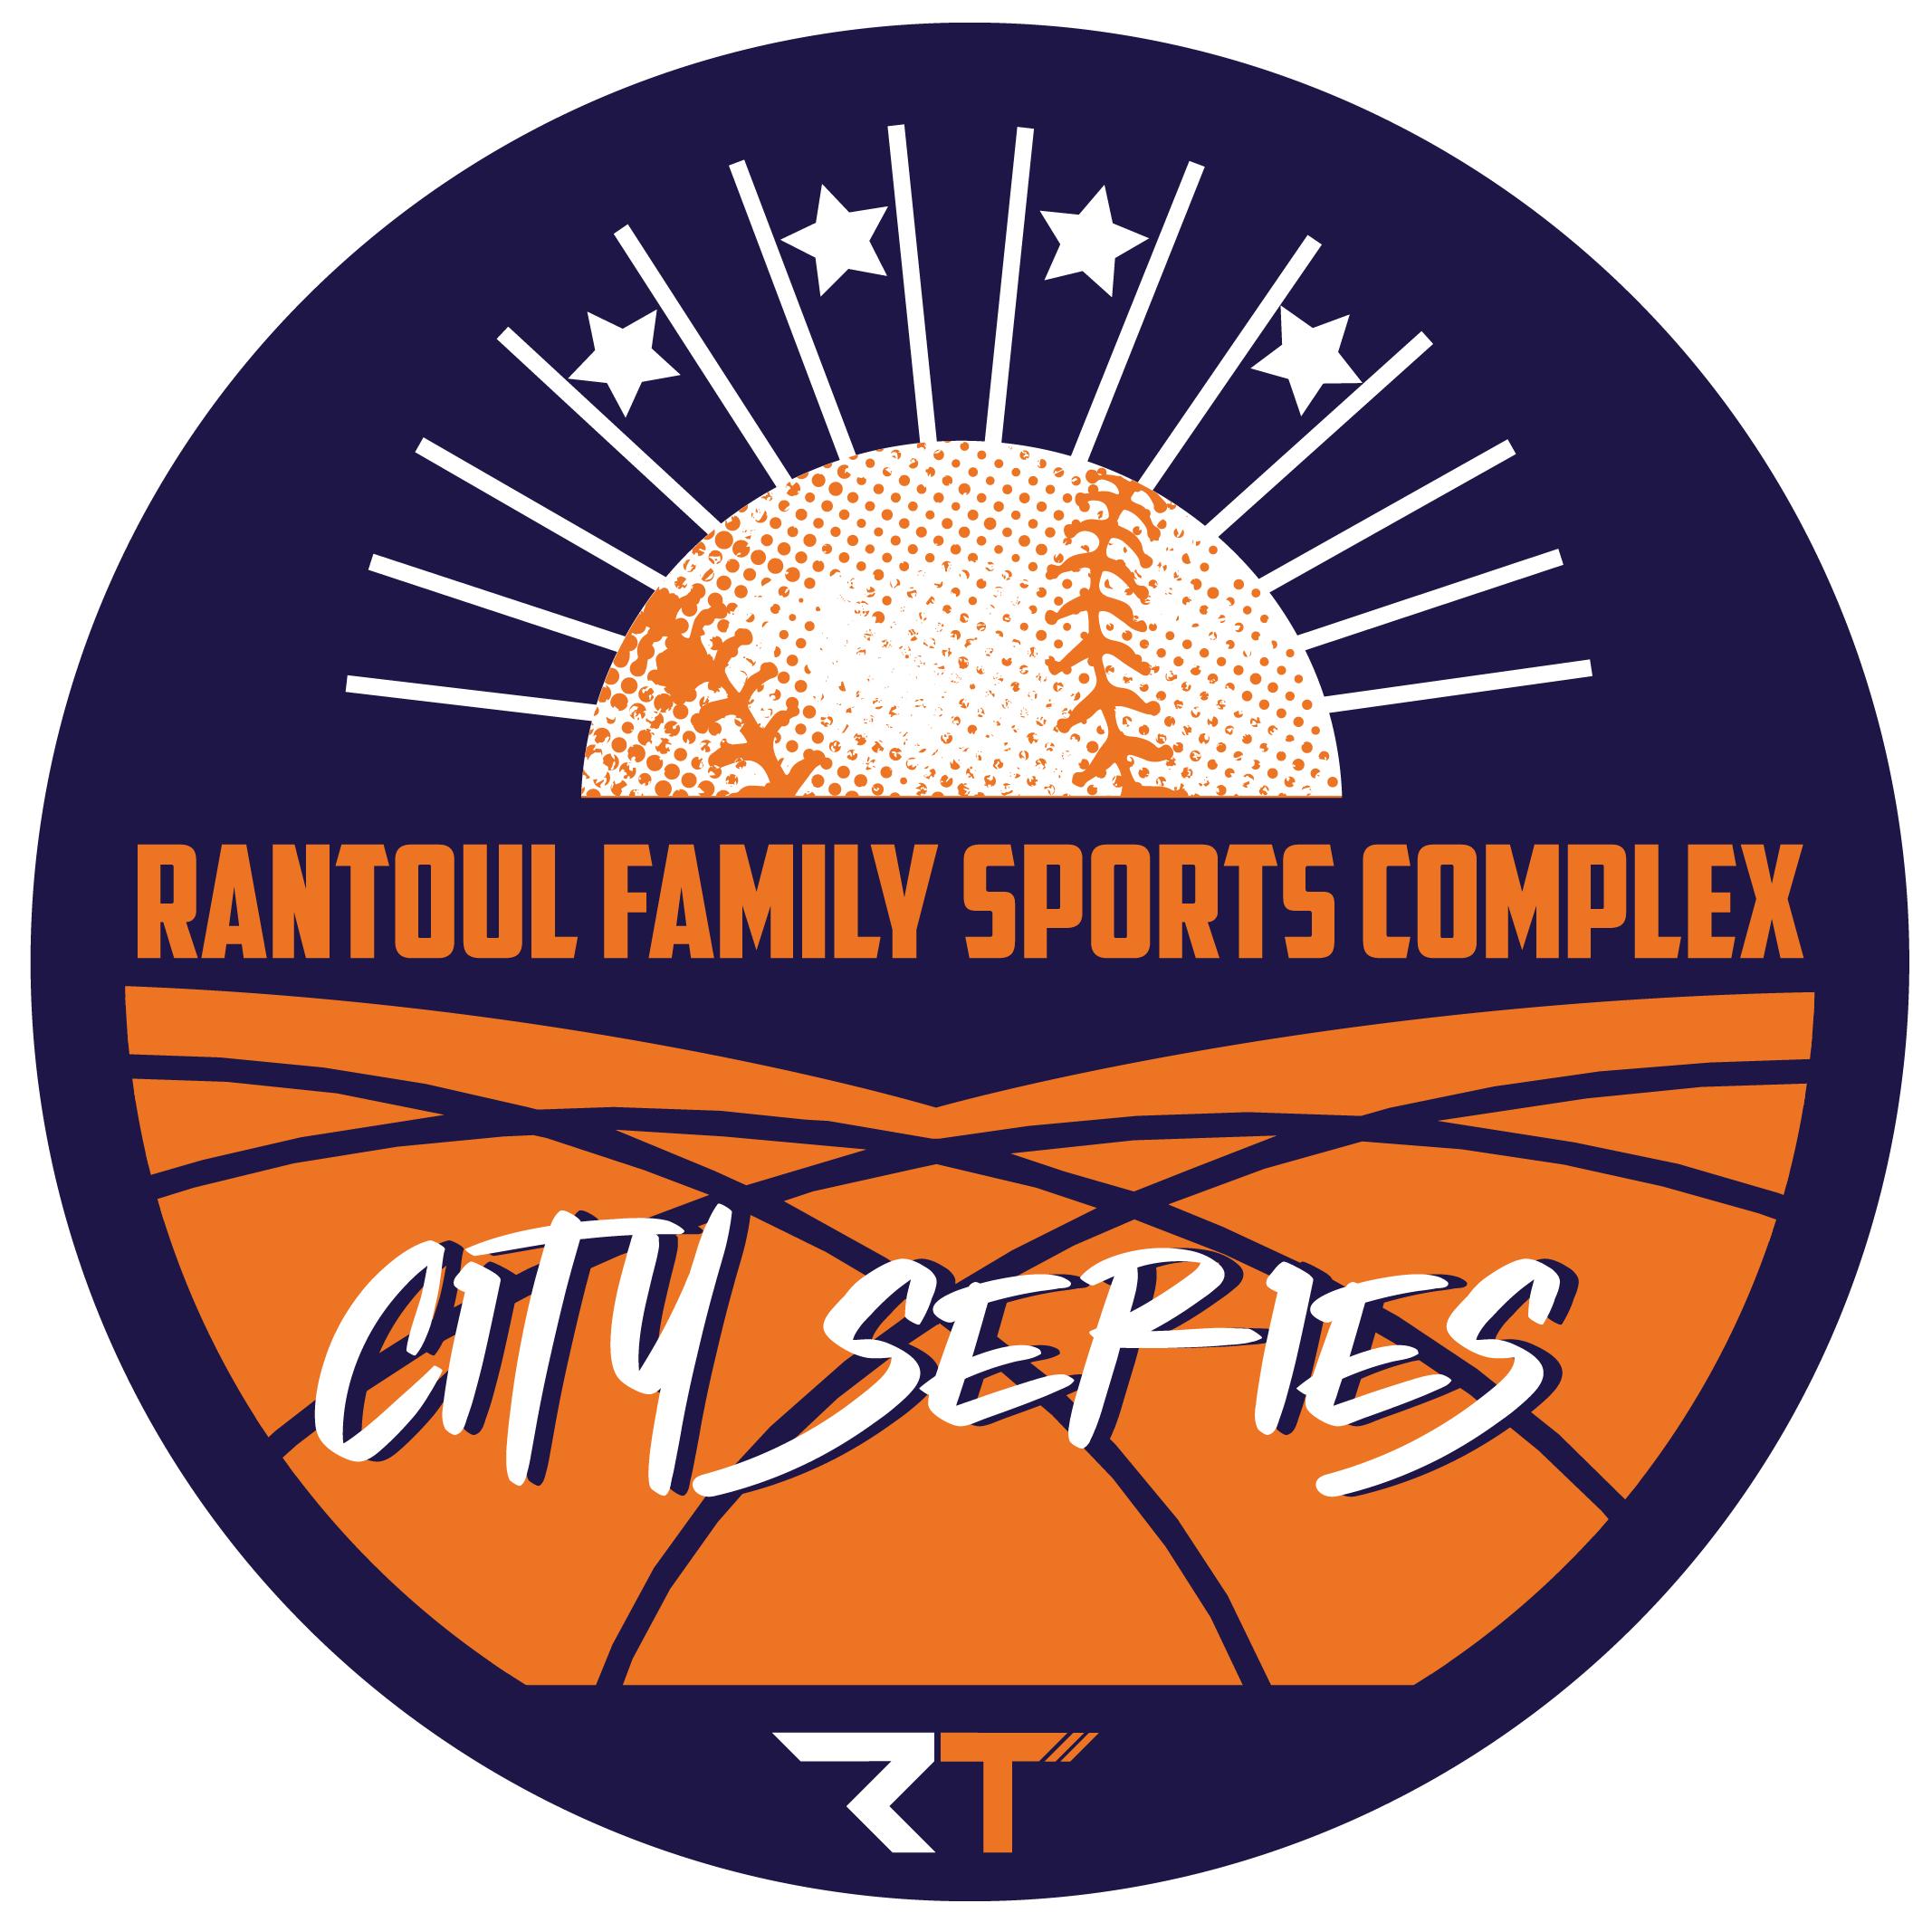 City Series - Rantoul